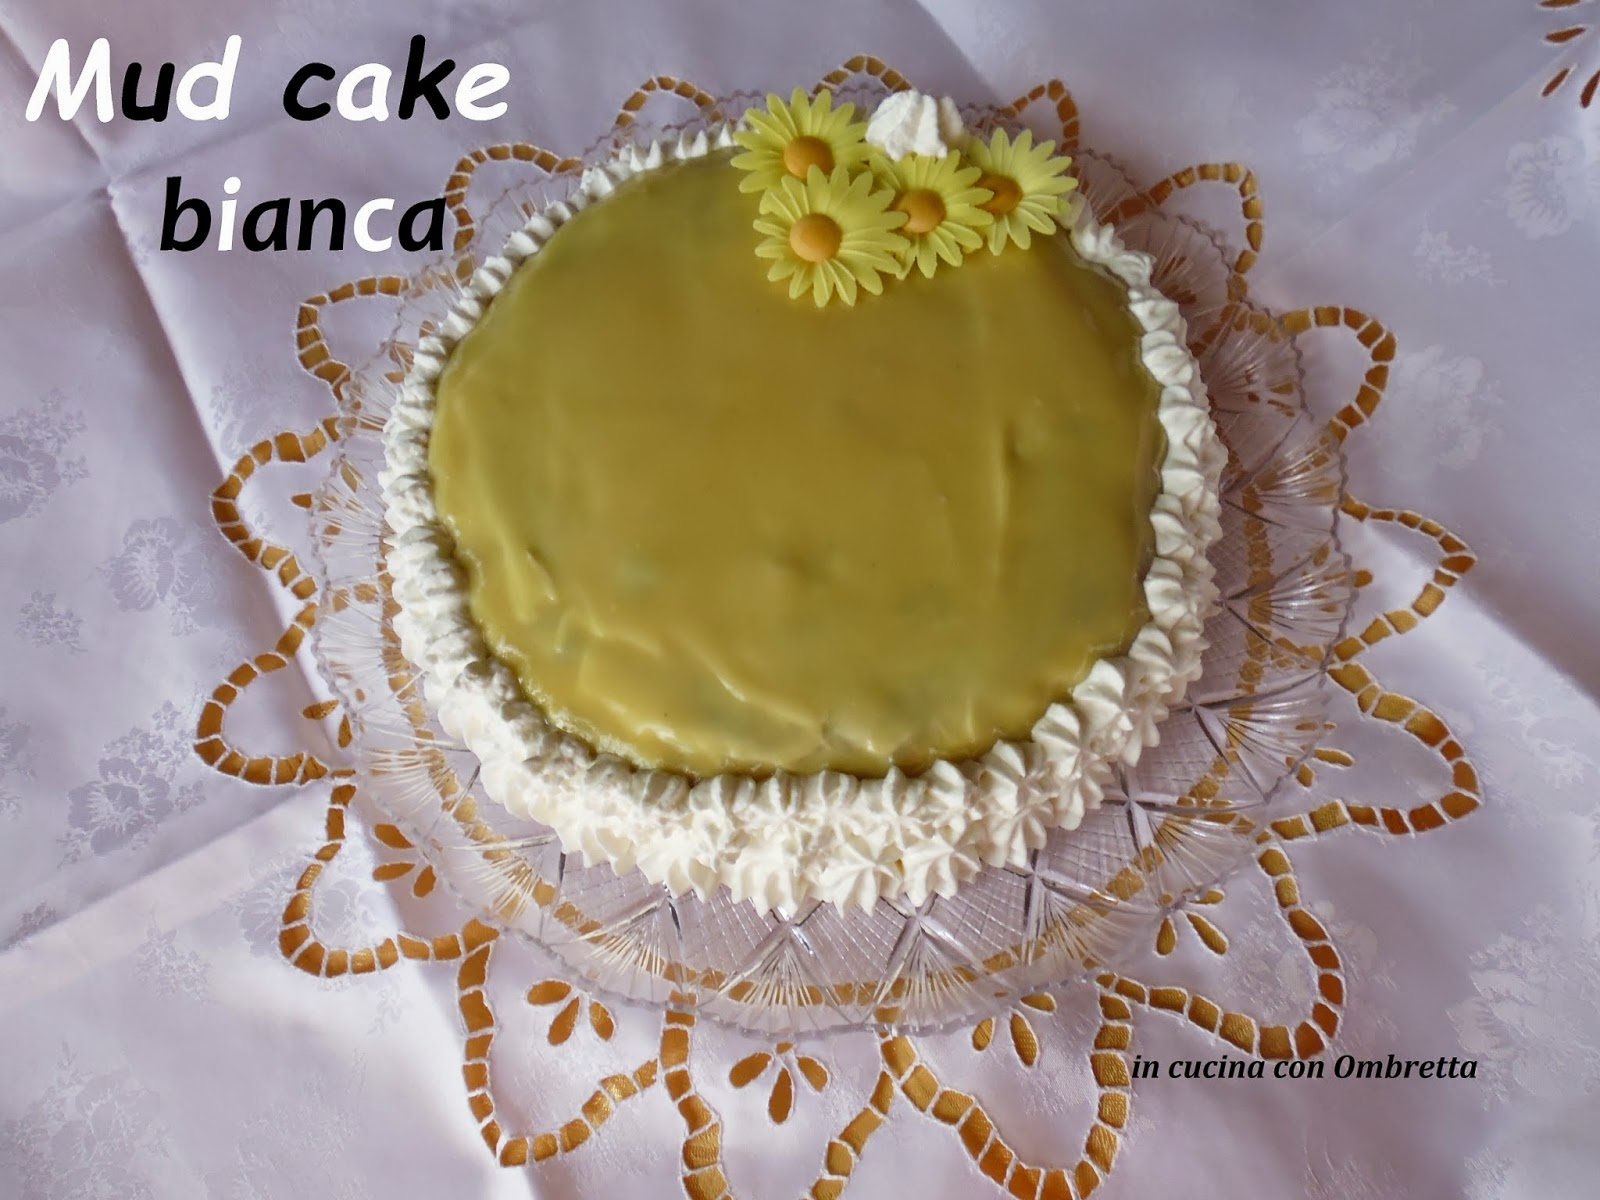 mud cake bianca